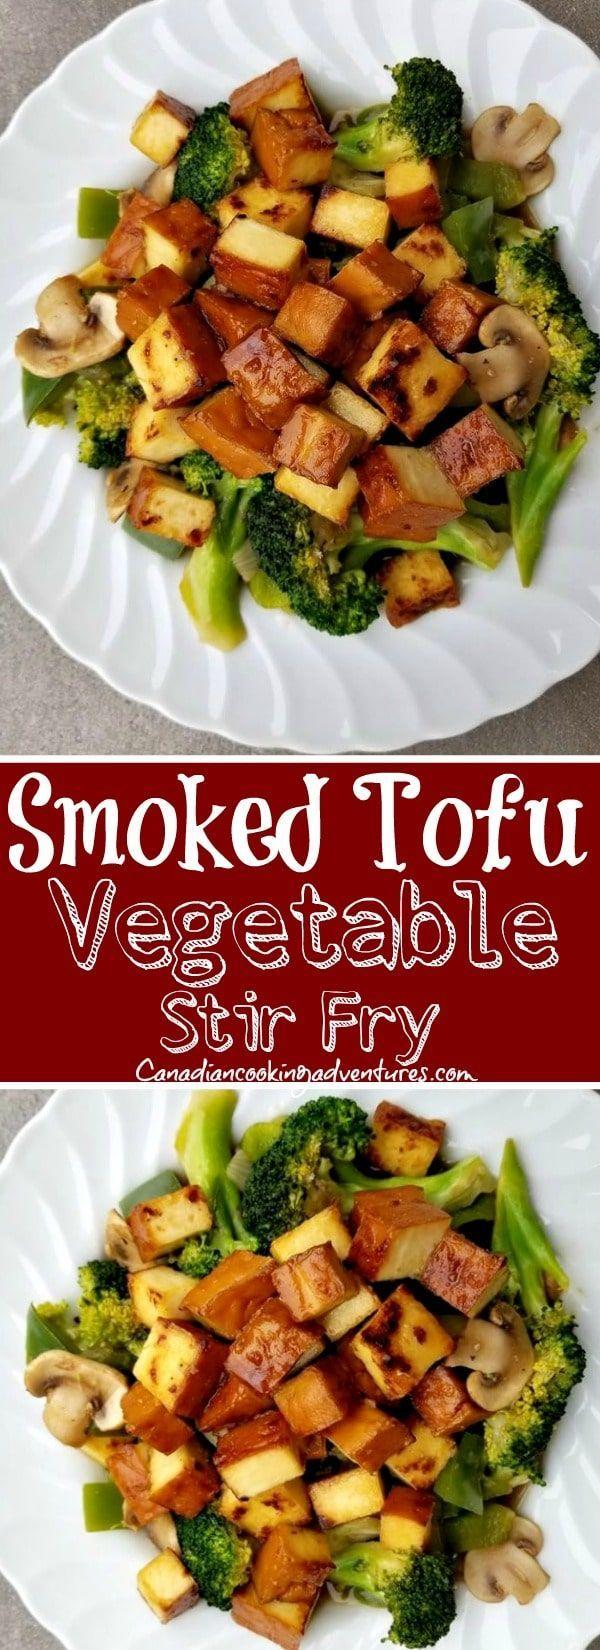 Smoked Tofu Vegetable Stir Fry Recipe Tofu Recipes Healthy Smoked Tofu Recipe Tofu Recipes